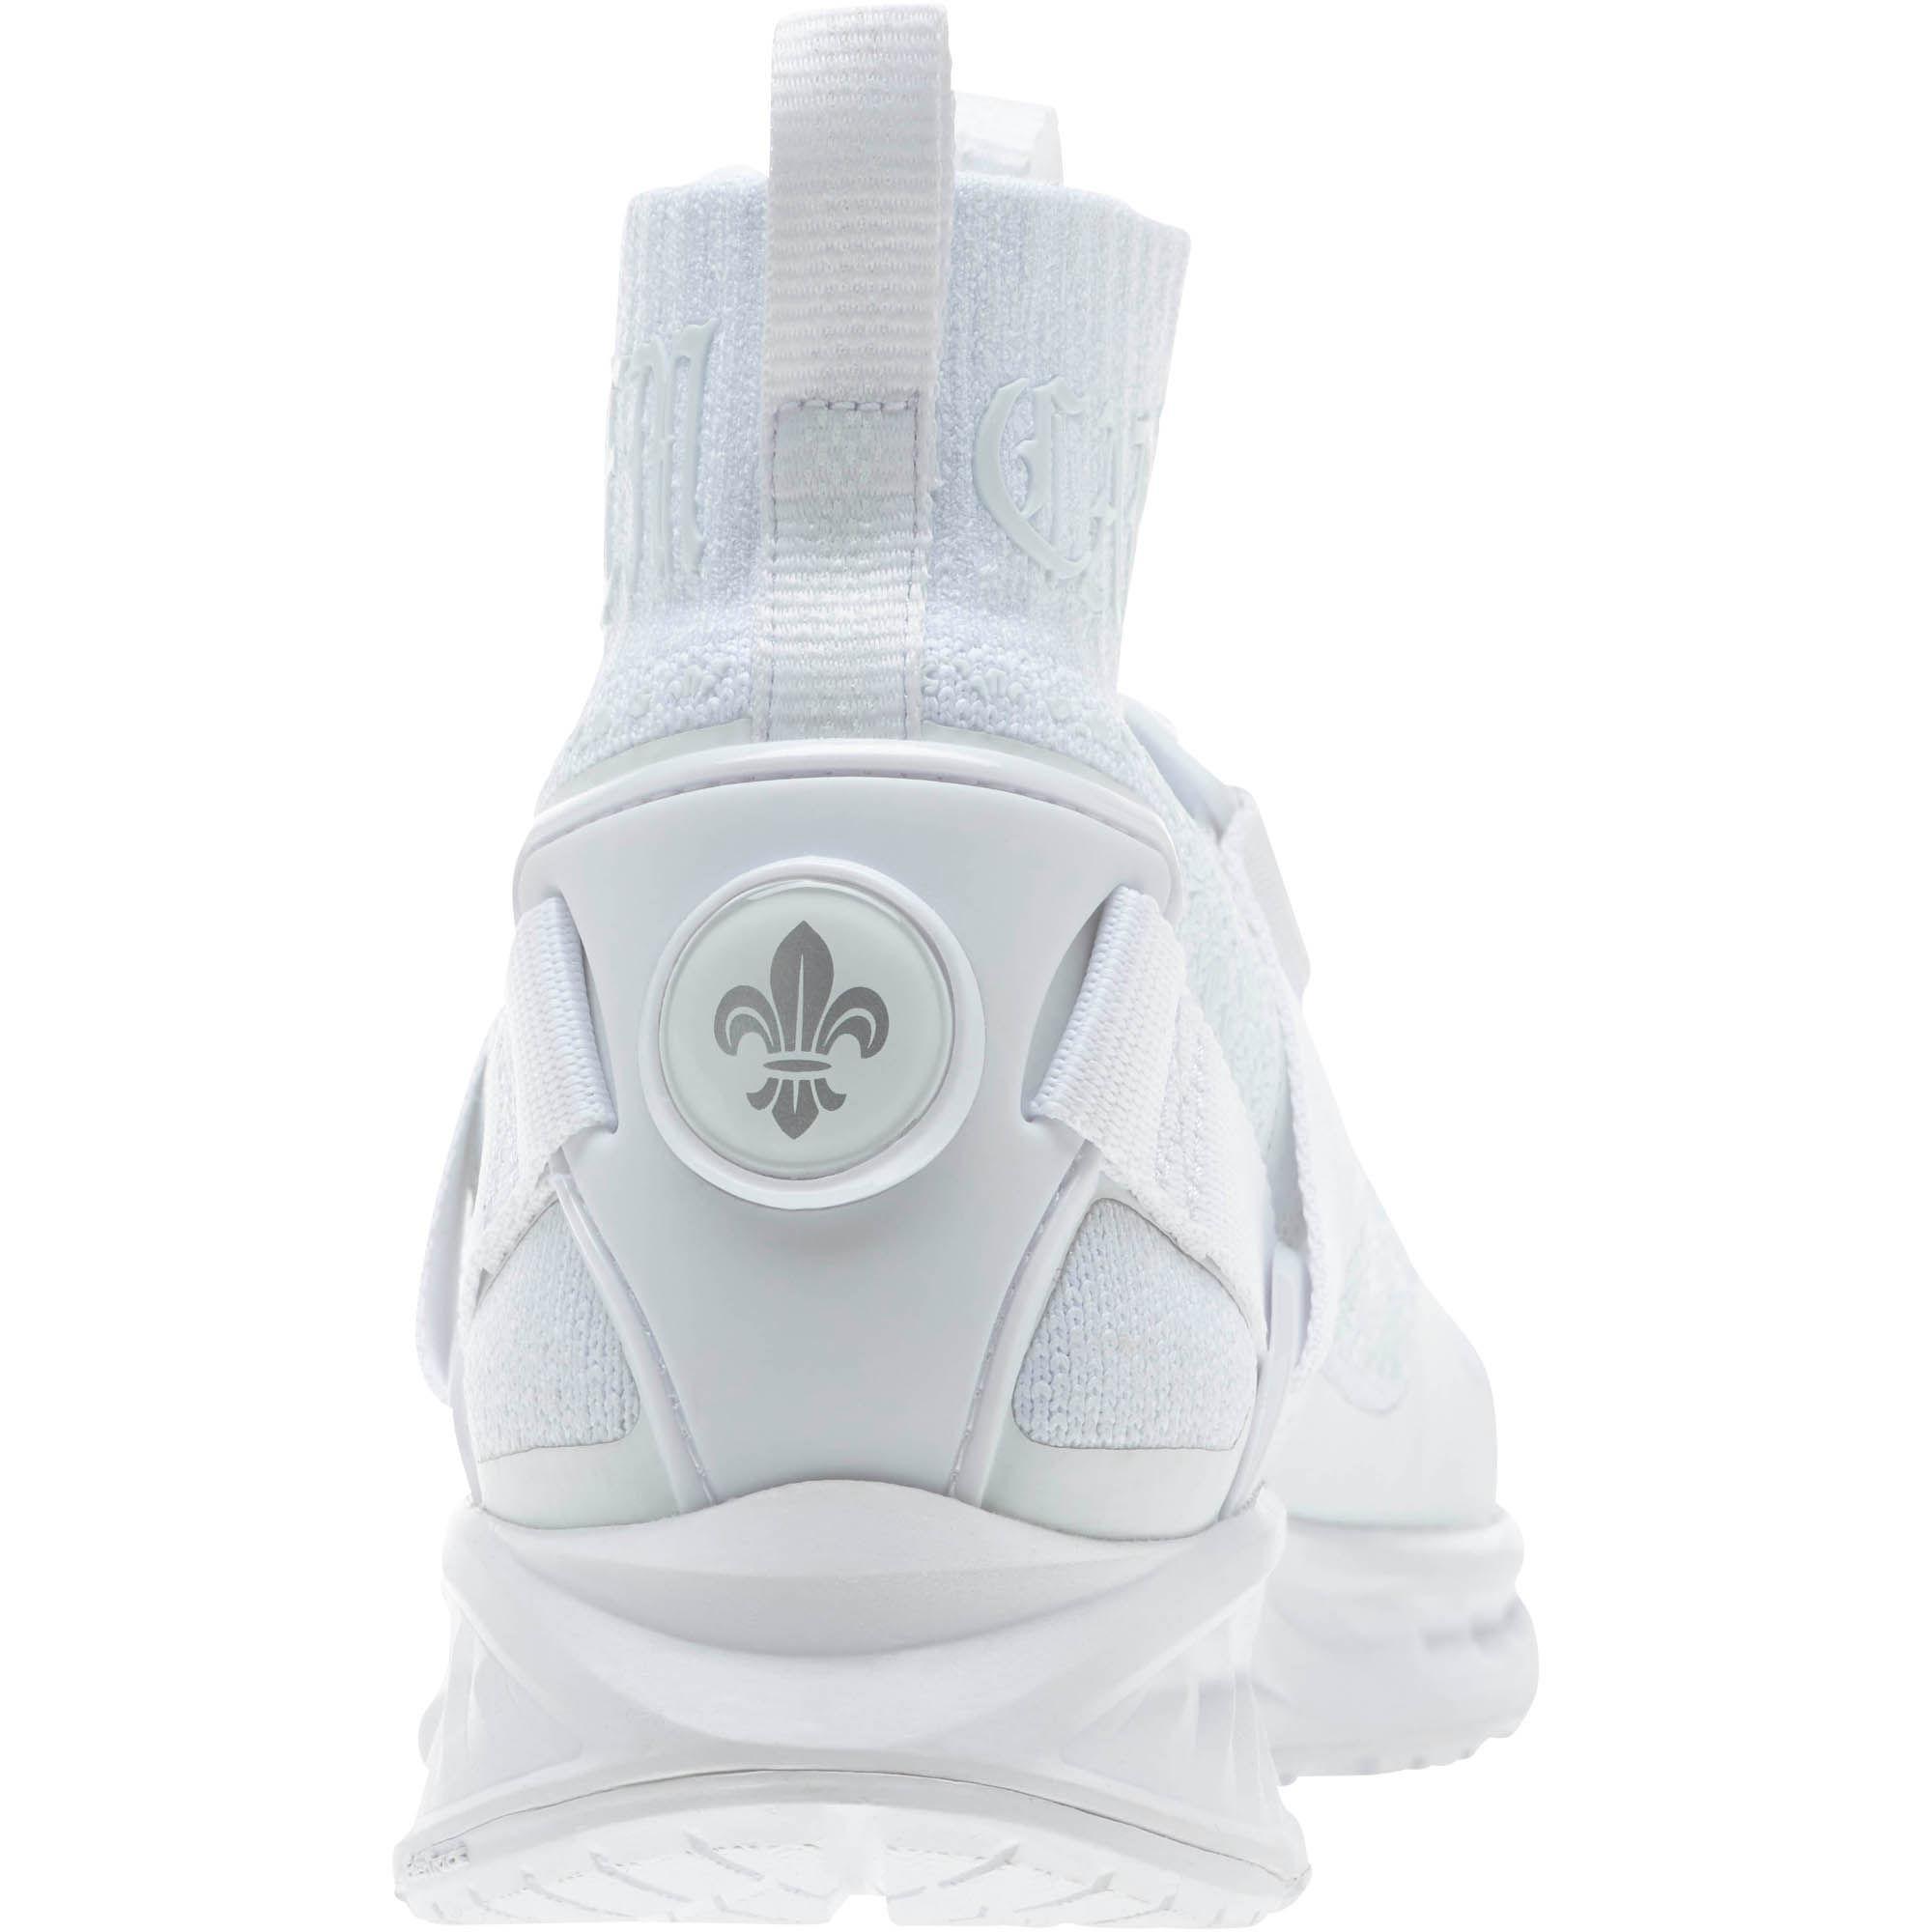 super popular 33d29 5d442 White Ignite Evoknit En Noir Men's Training Shoes